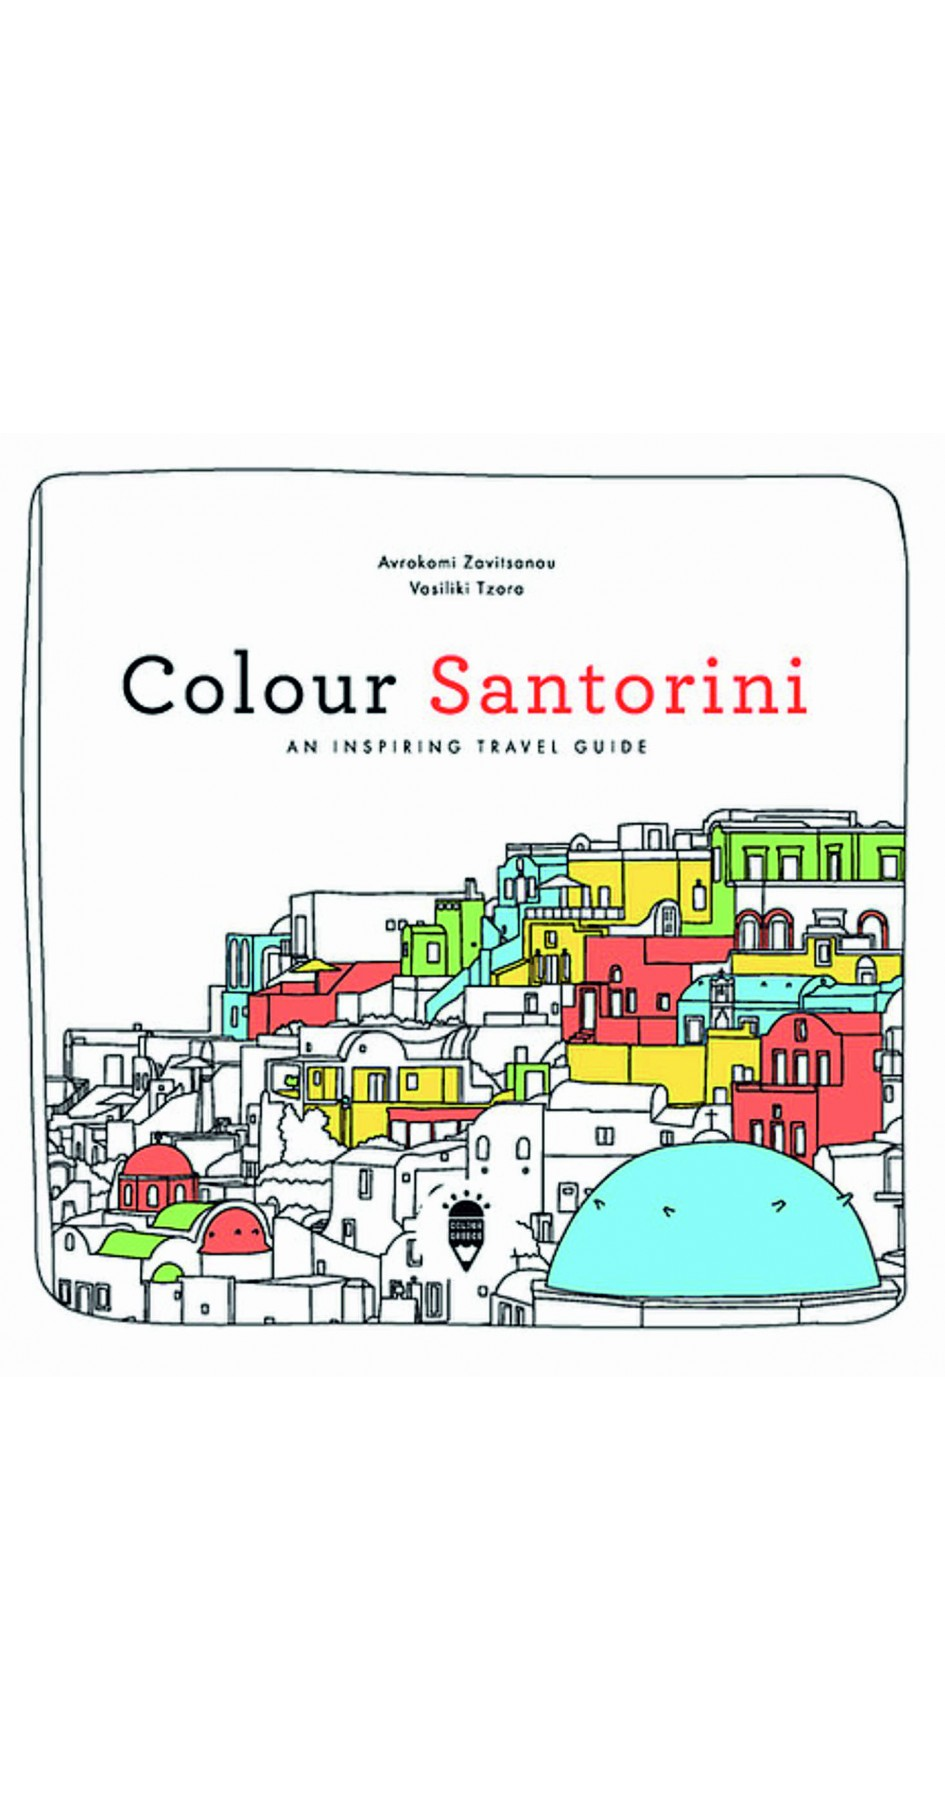 Colour Santorini